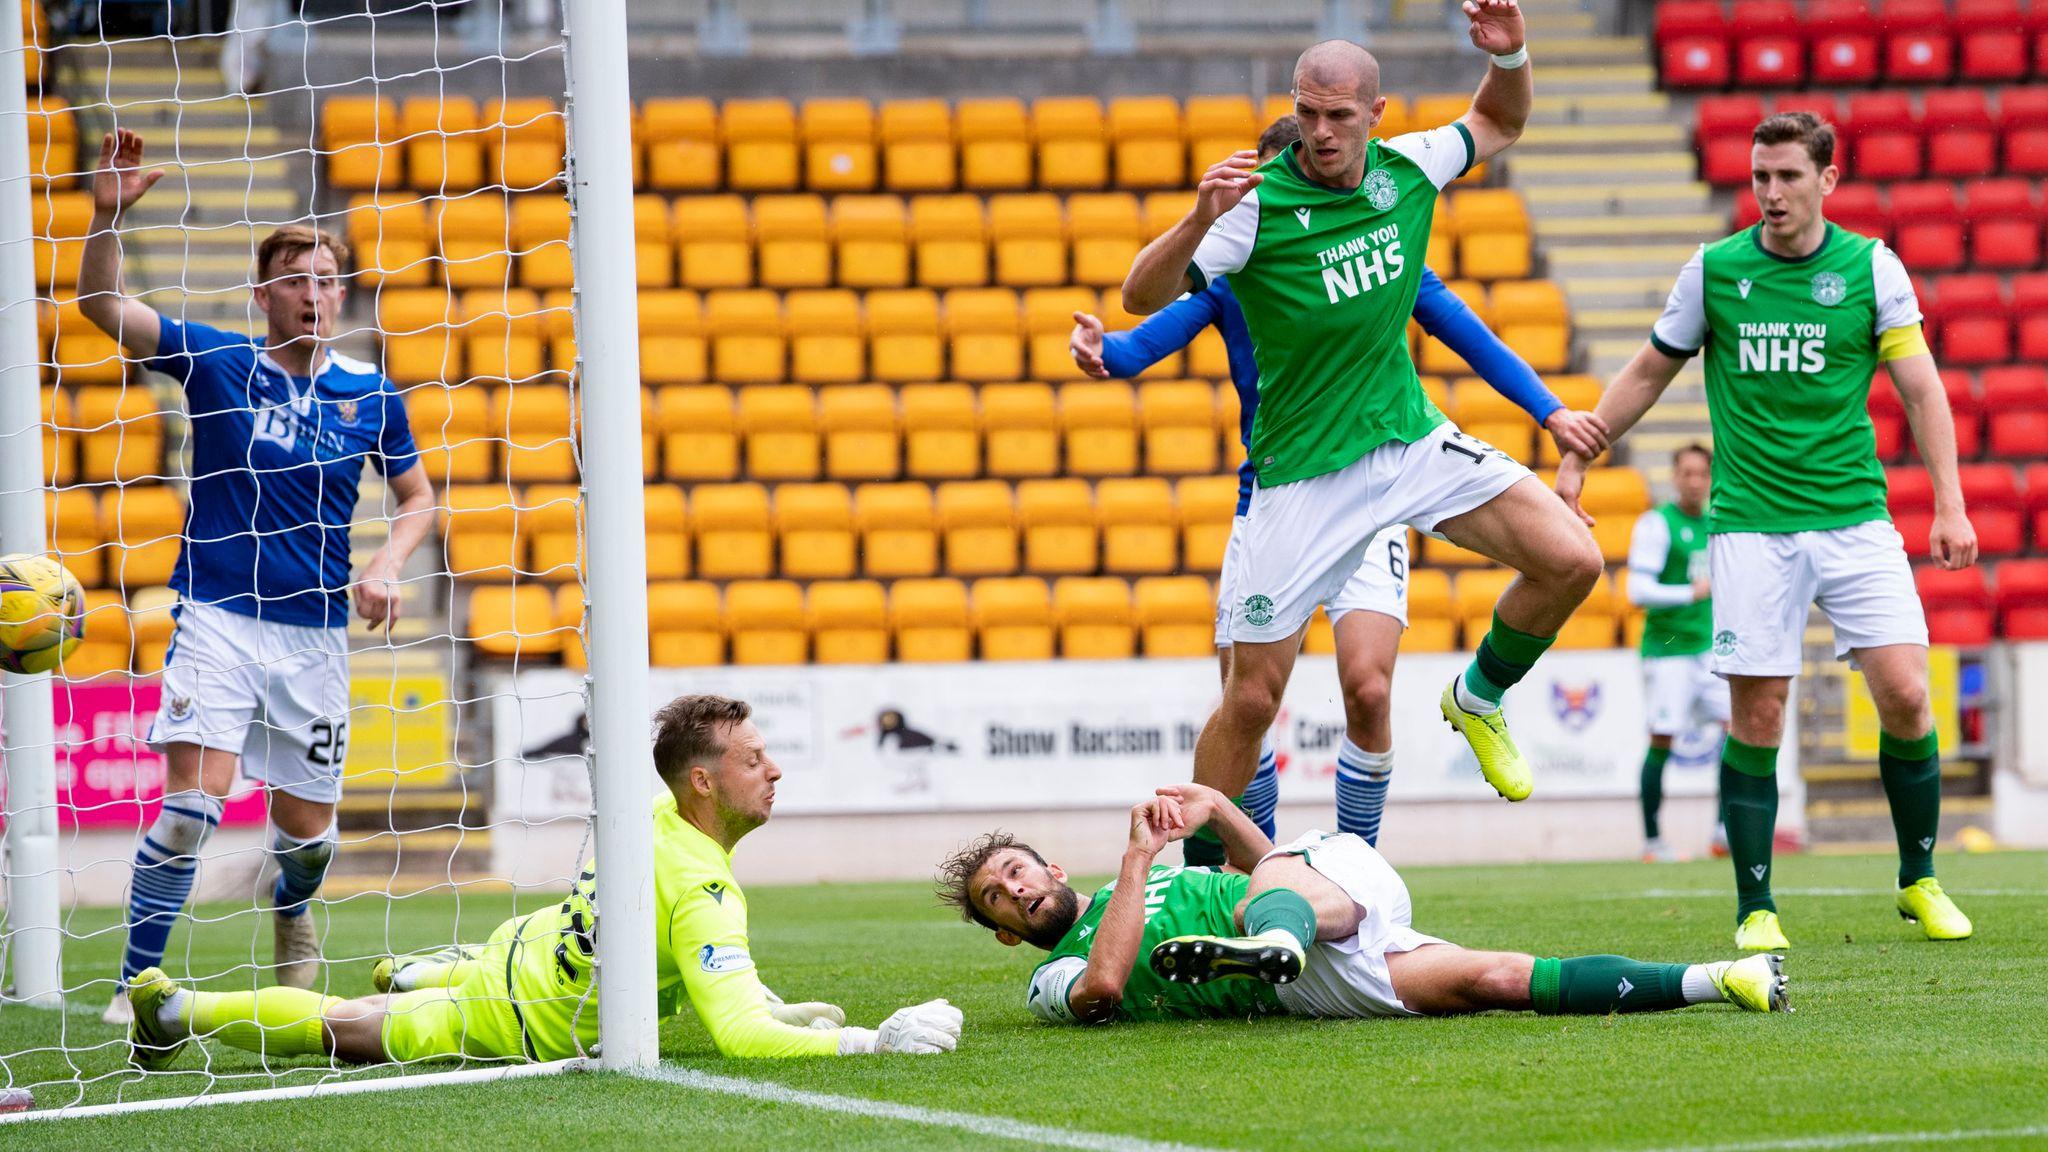 Hibernian's Christian Doidge has his goal disallowed for handball